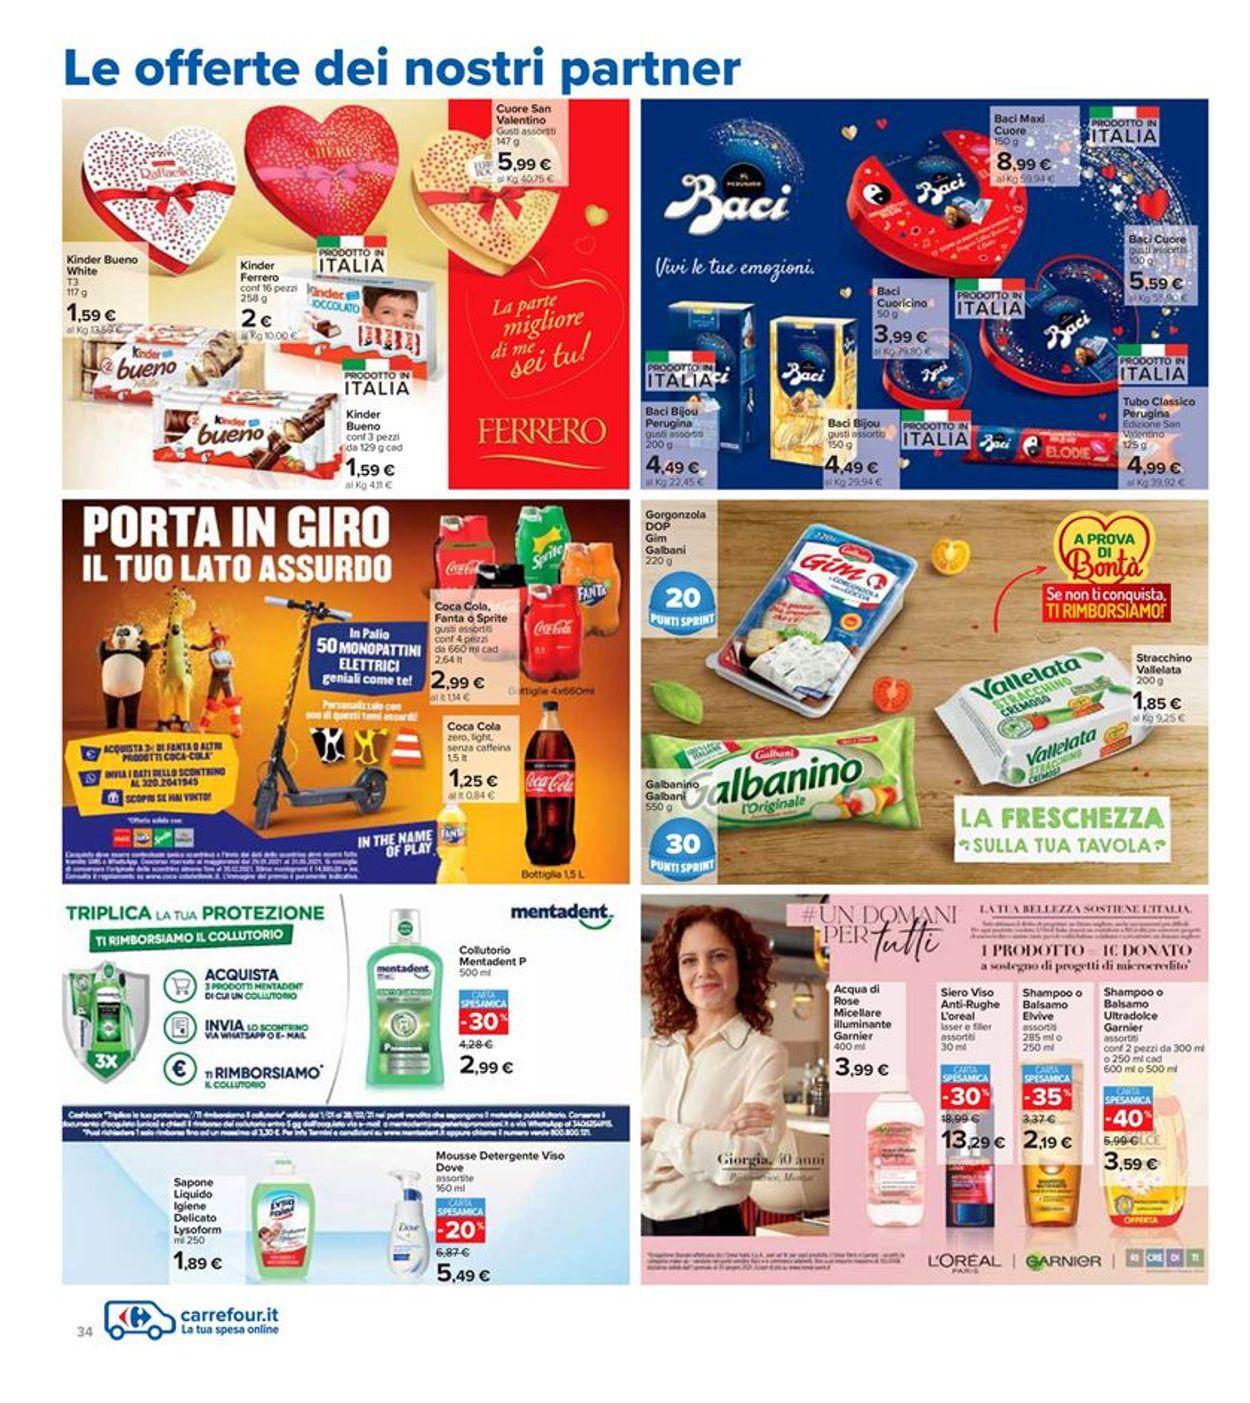 Volantino Carrefour Iper - Offerte 11/02-25/02/2021 (Pagina 34)